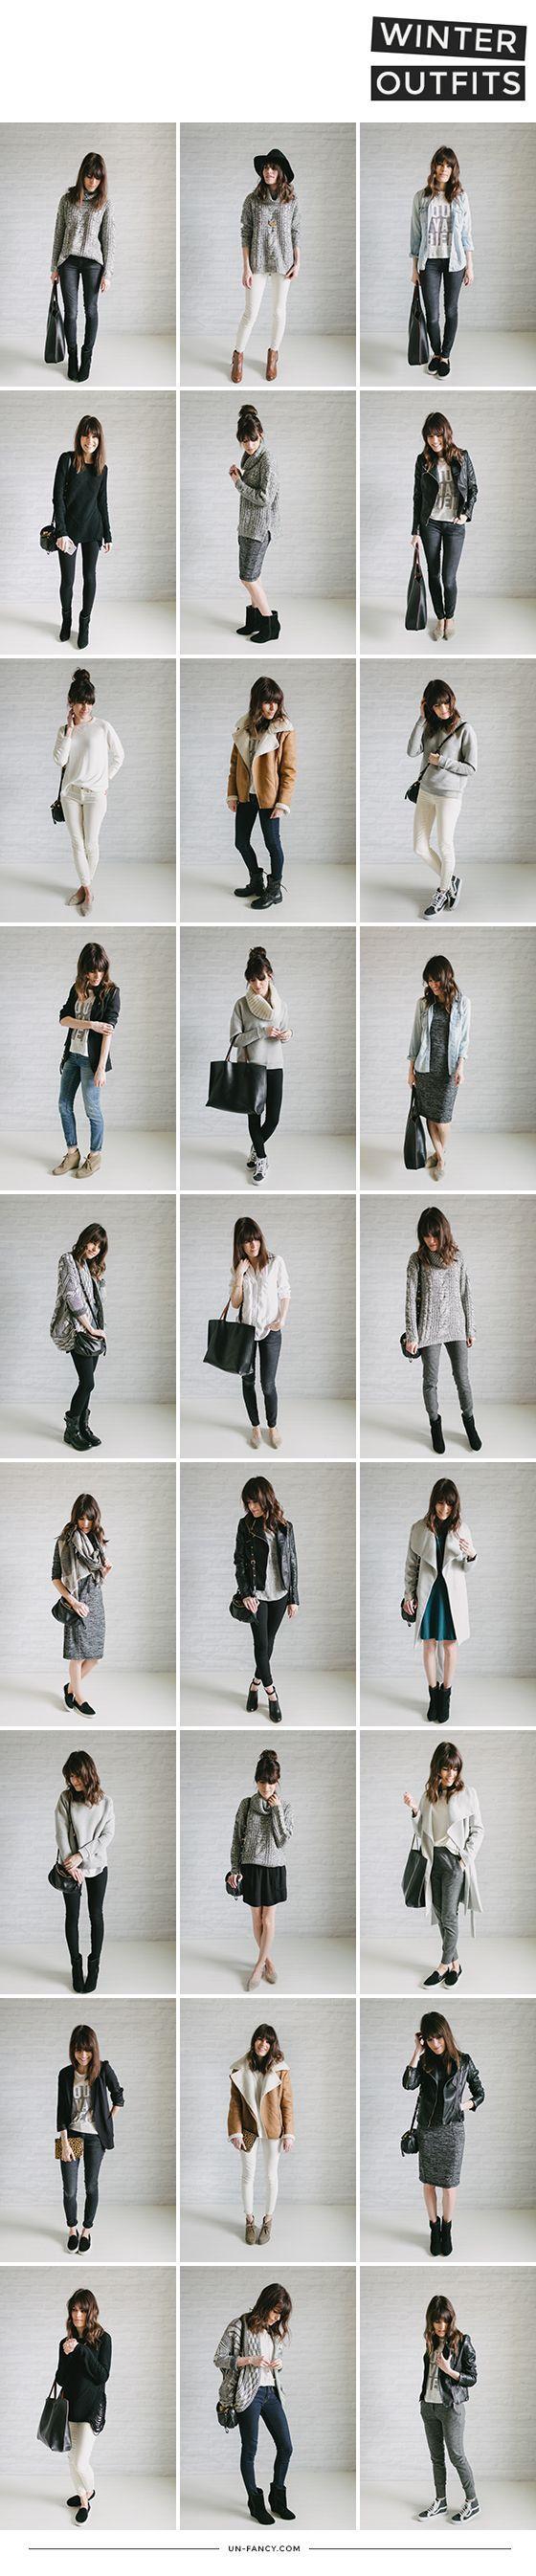 Un-Fancy's Winter Outfits | Capsule Wardrobe